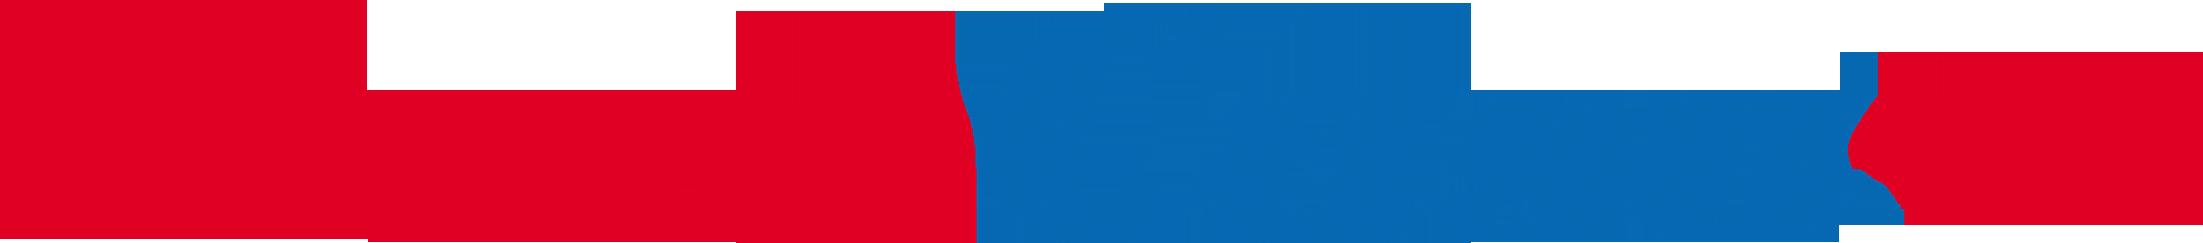 TrovoCasaNet